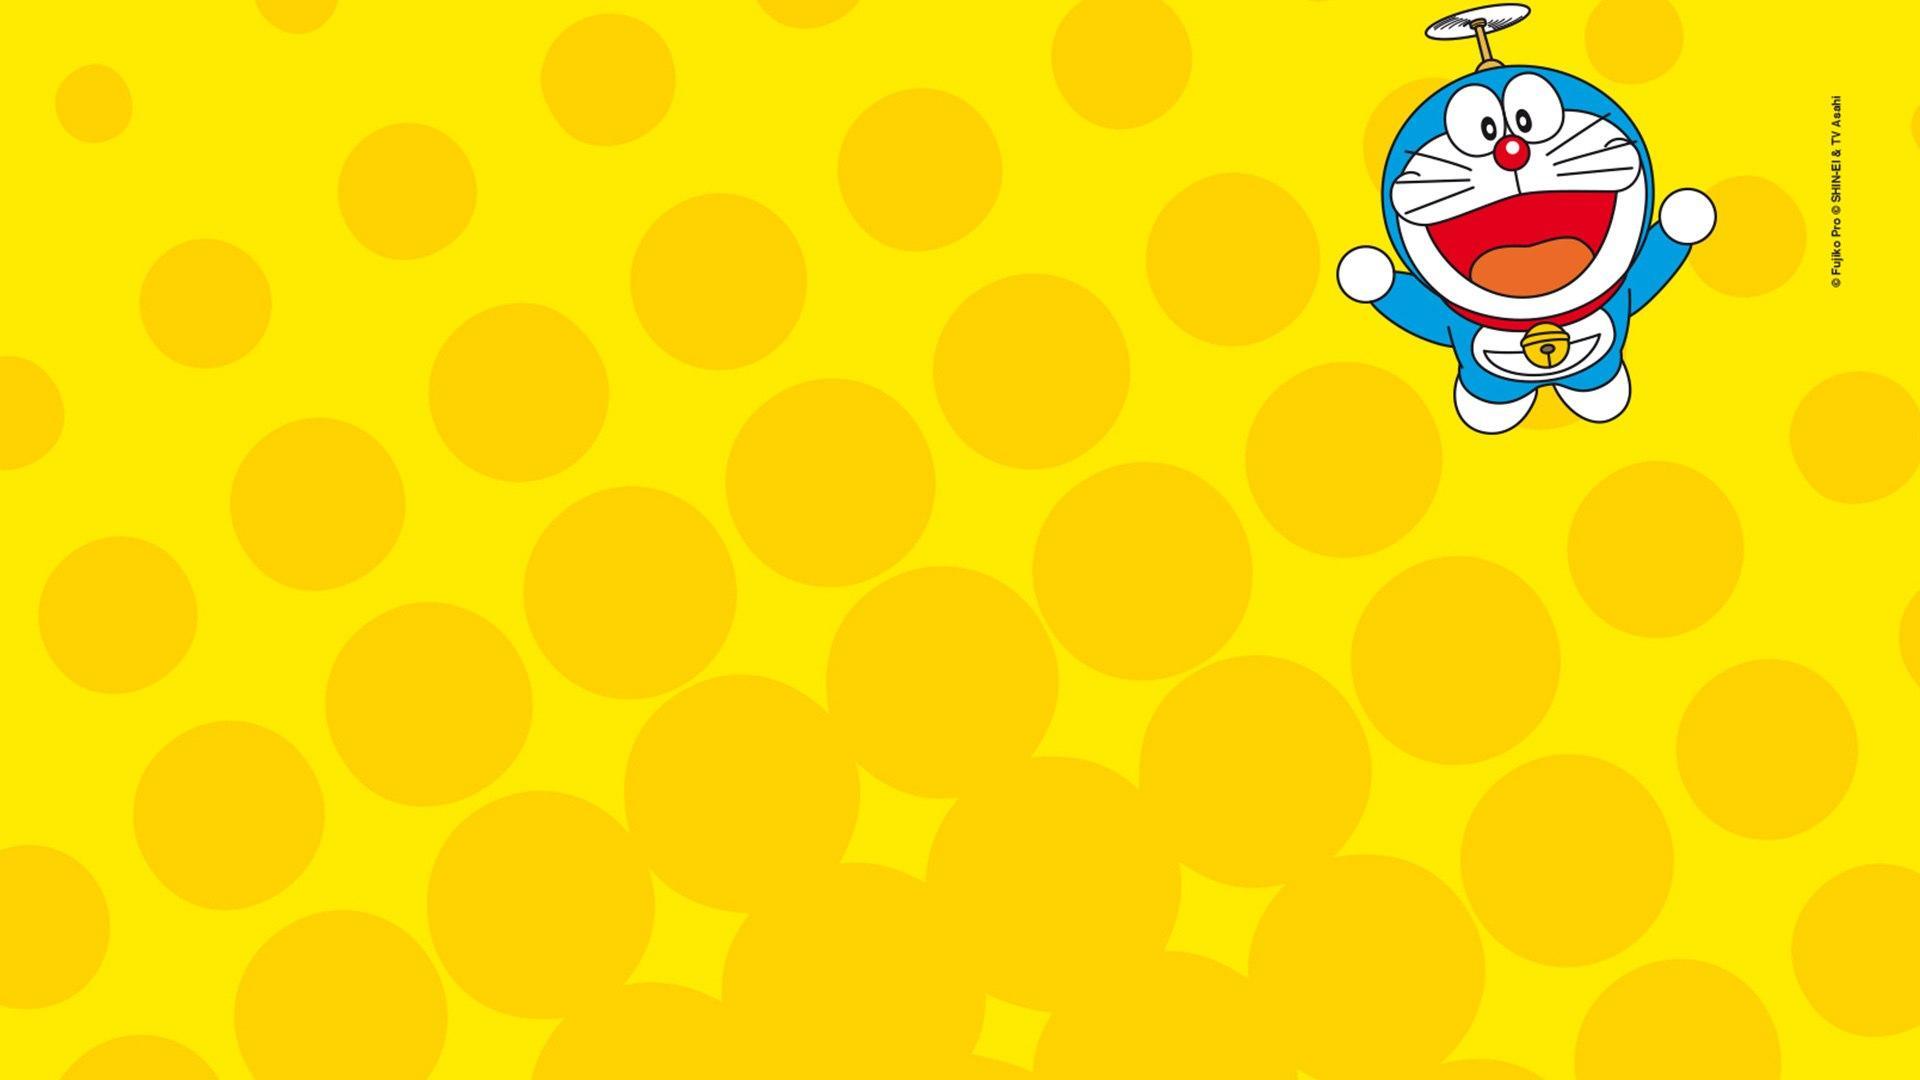 Boomerang Doraemon